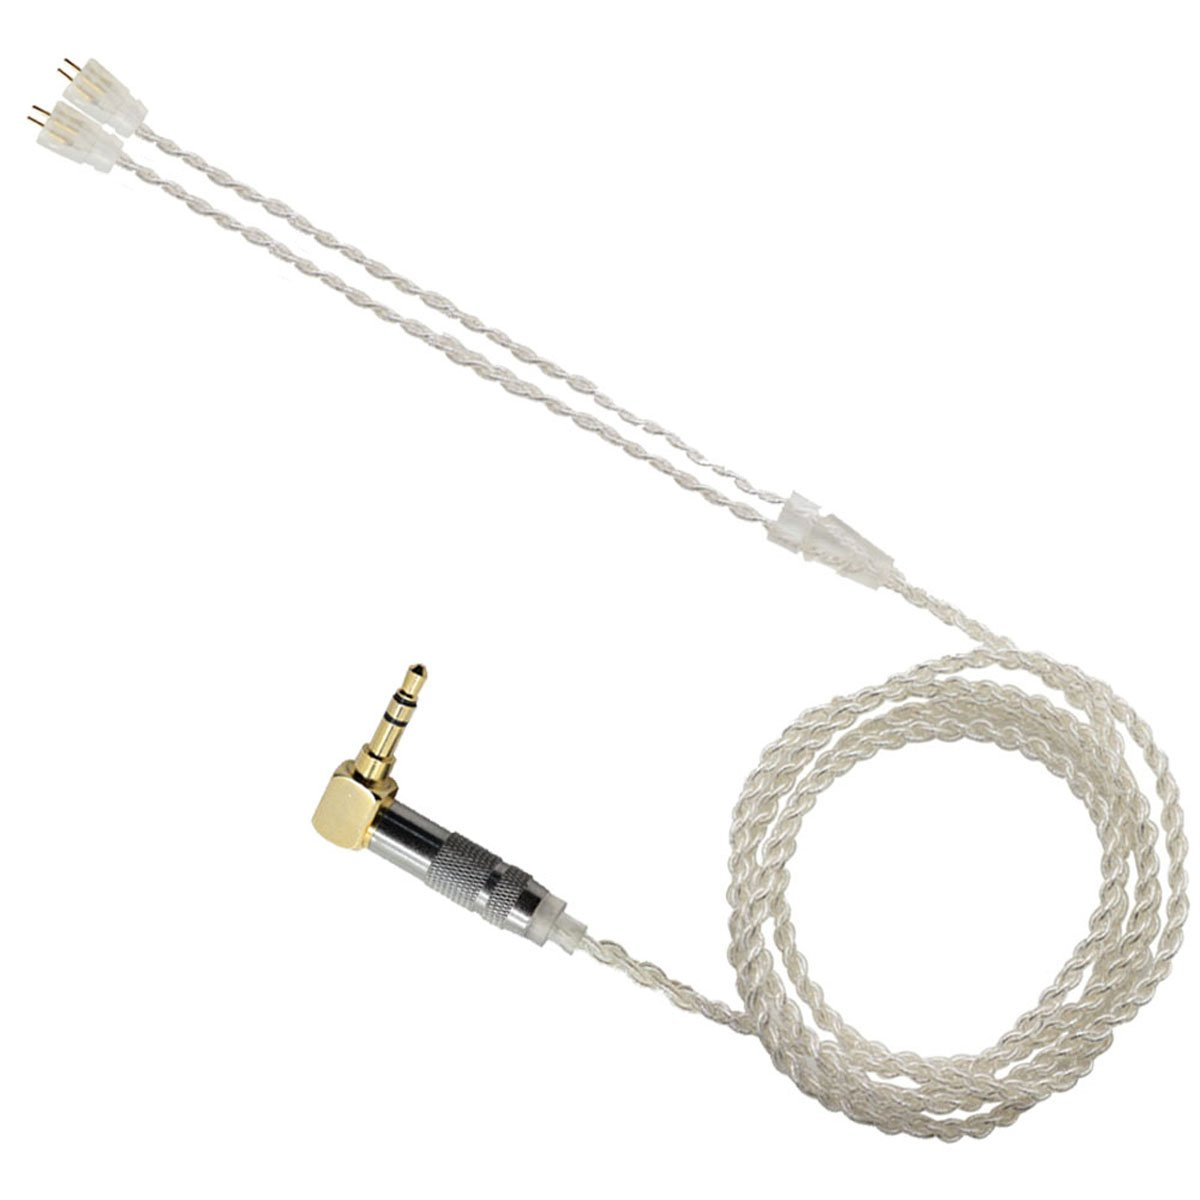 Audio Kable For Ultimate Ears UE FI10 TF15 TF10 SF3 SF5 Kopfhörer Headset